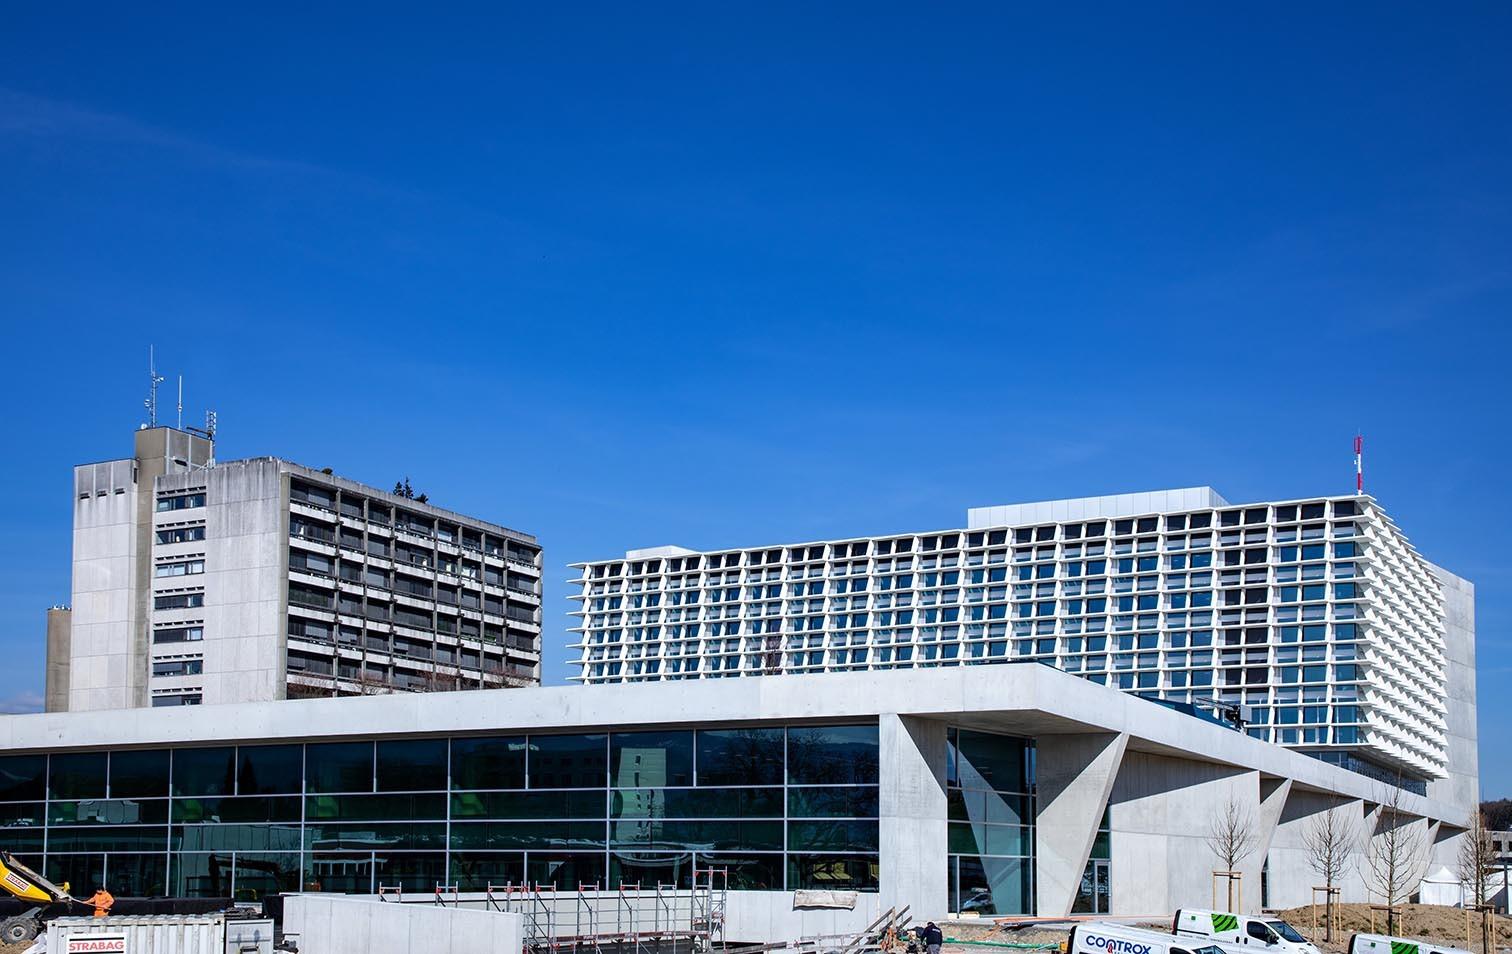 Neubau Bürgerspital Solothurn im März 2020